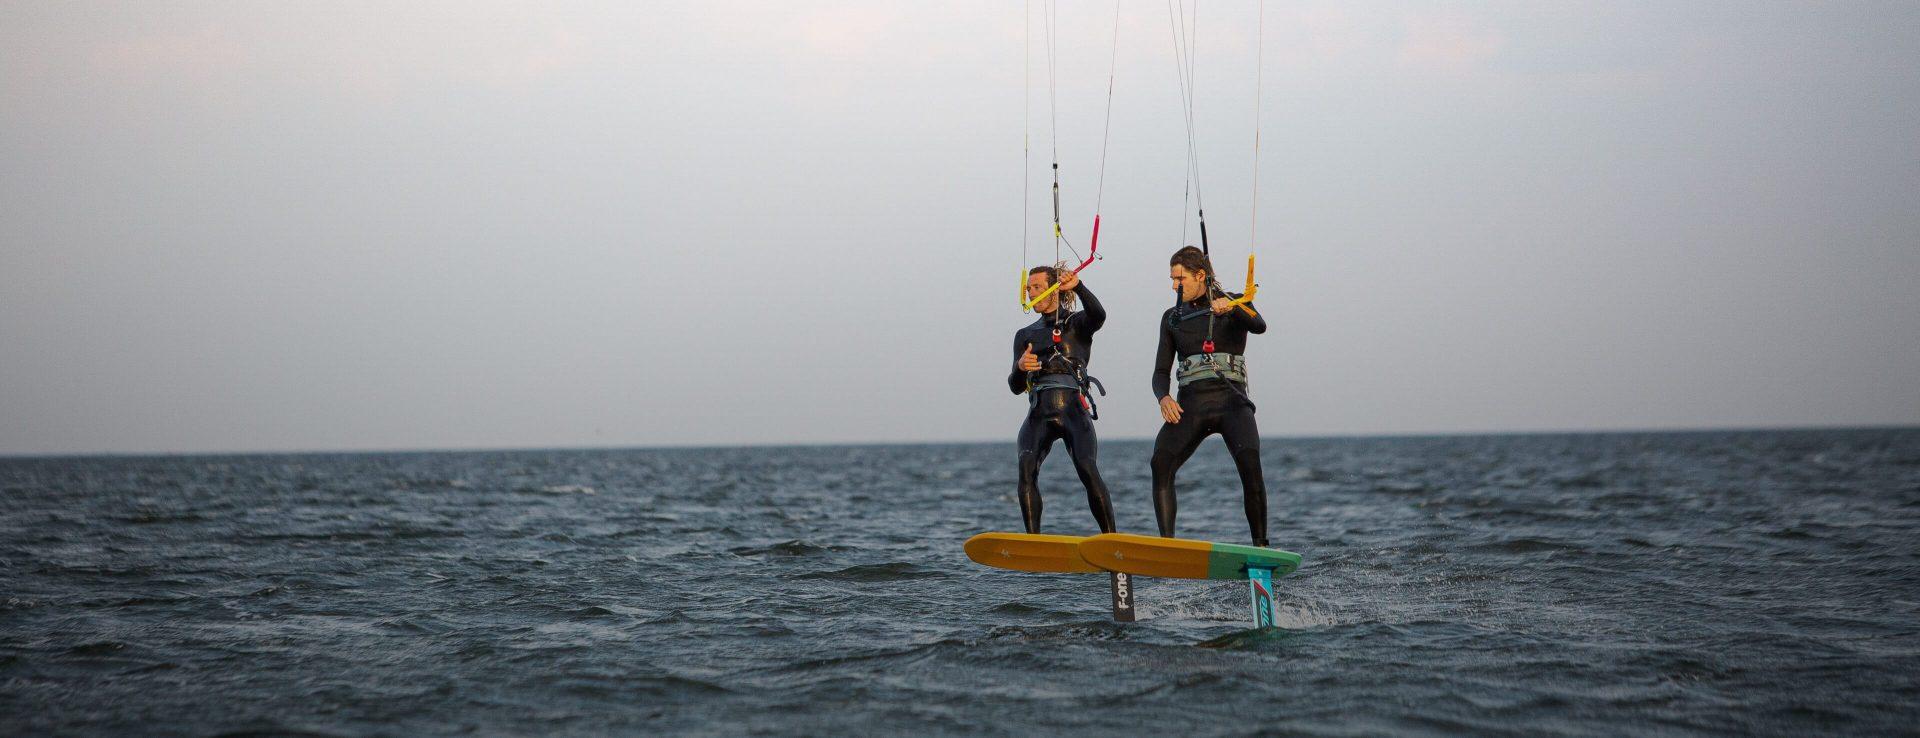 dwóch mężczyzn na kitefoilach